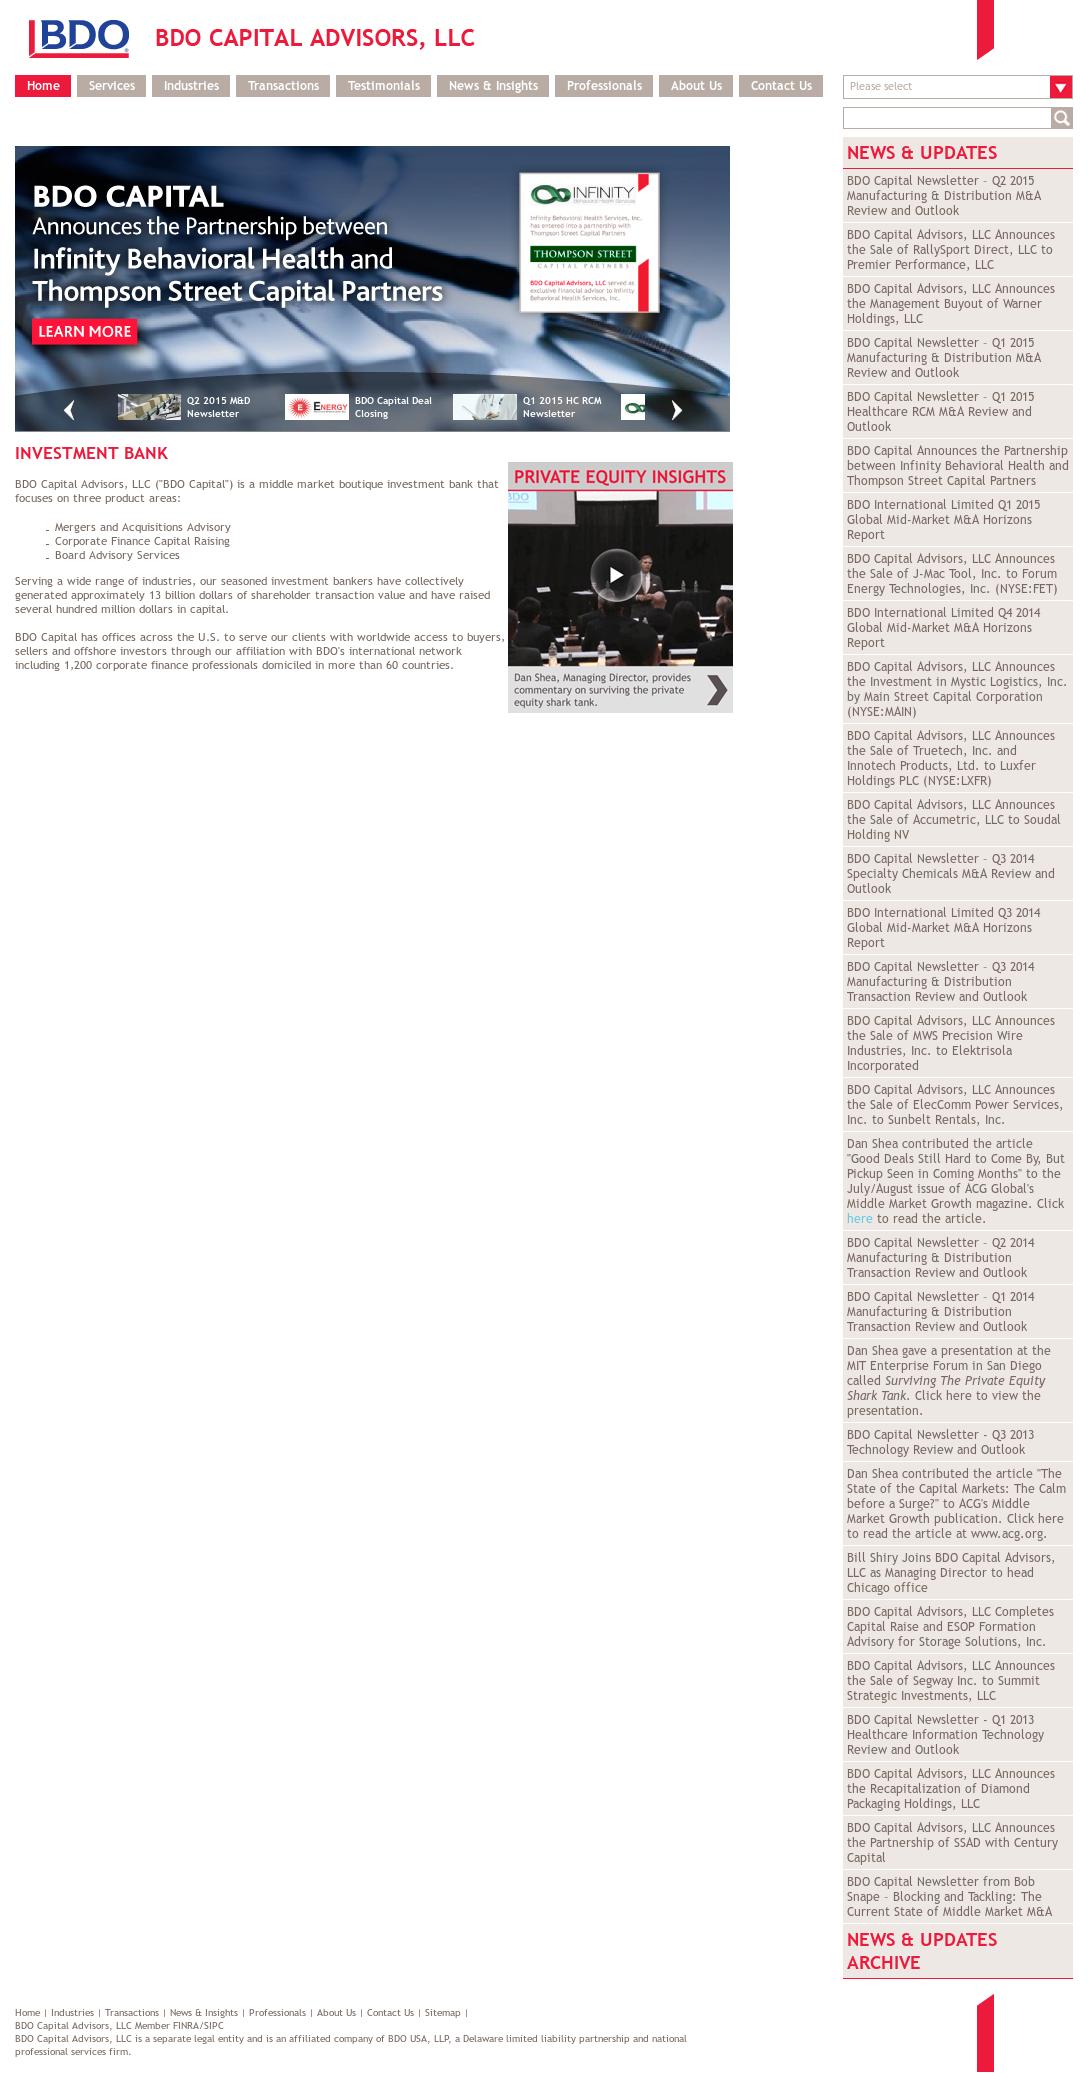 BDO Capital Advisors Competitors, Revenue and Employees - Owler